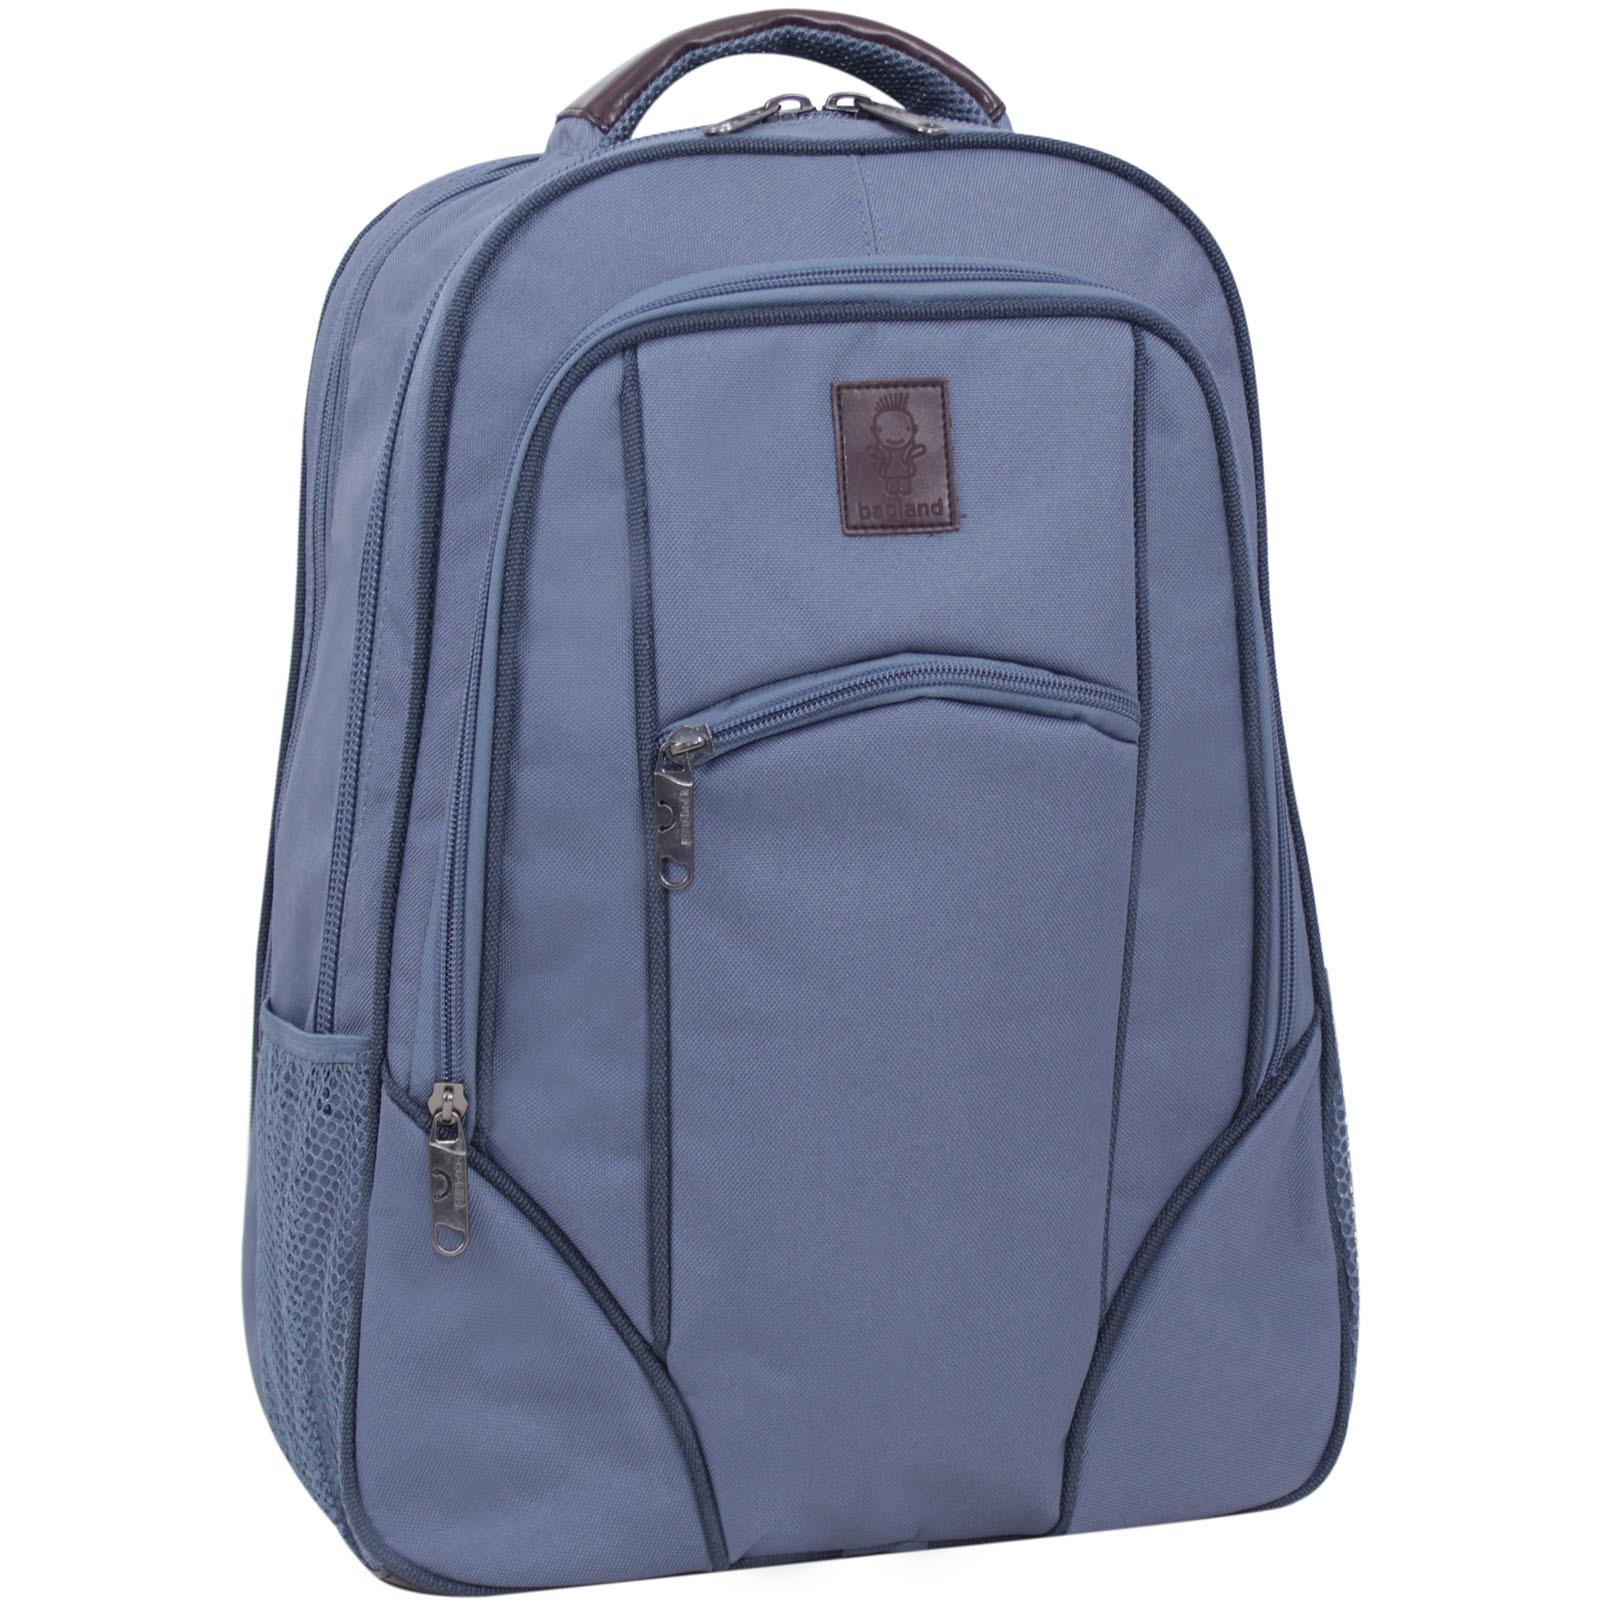 Рюкзаки для ноутбука Рюкзак для ноутбука Bagland Рюкзак под ноутбук 537 21 л. Серый (0053766) IMG_8815-1600.jpg